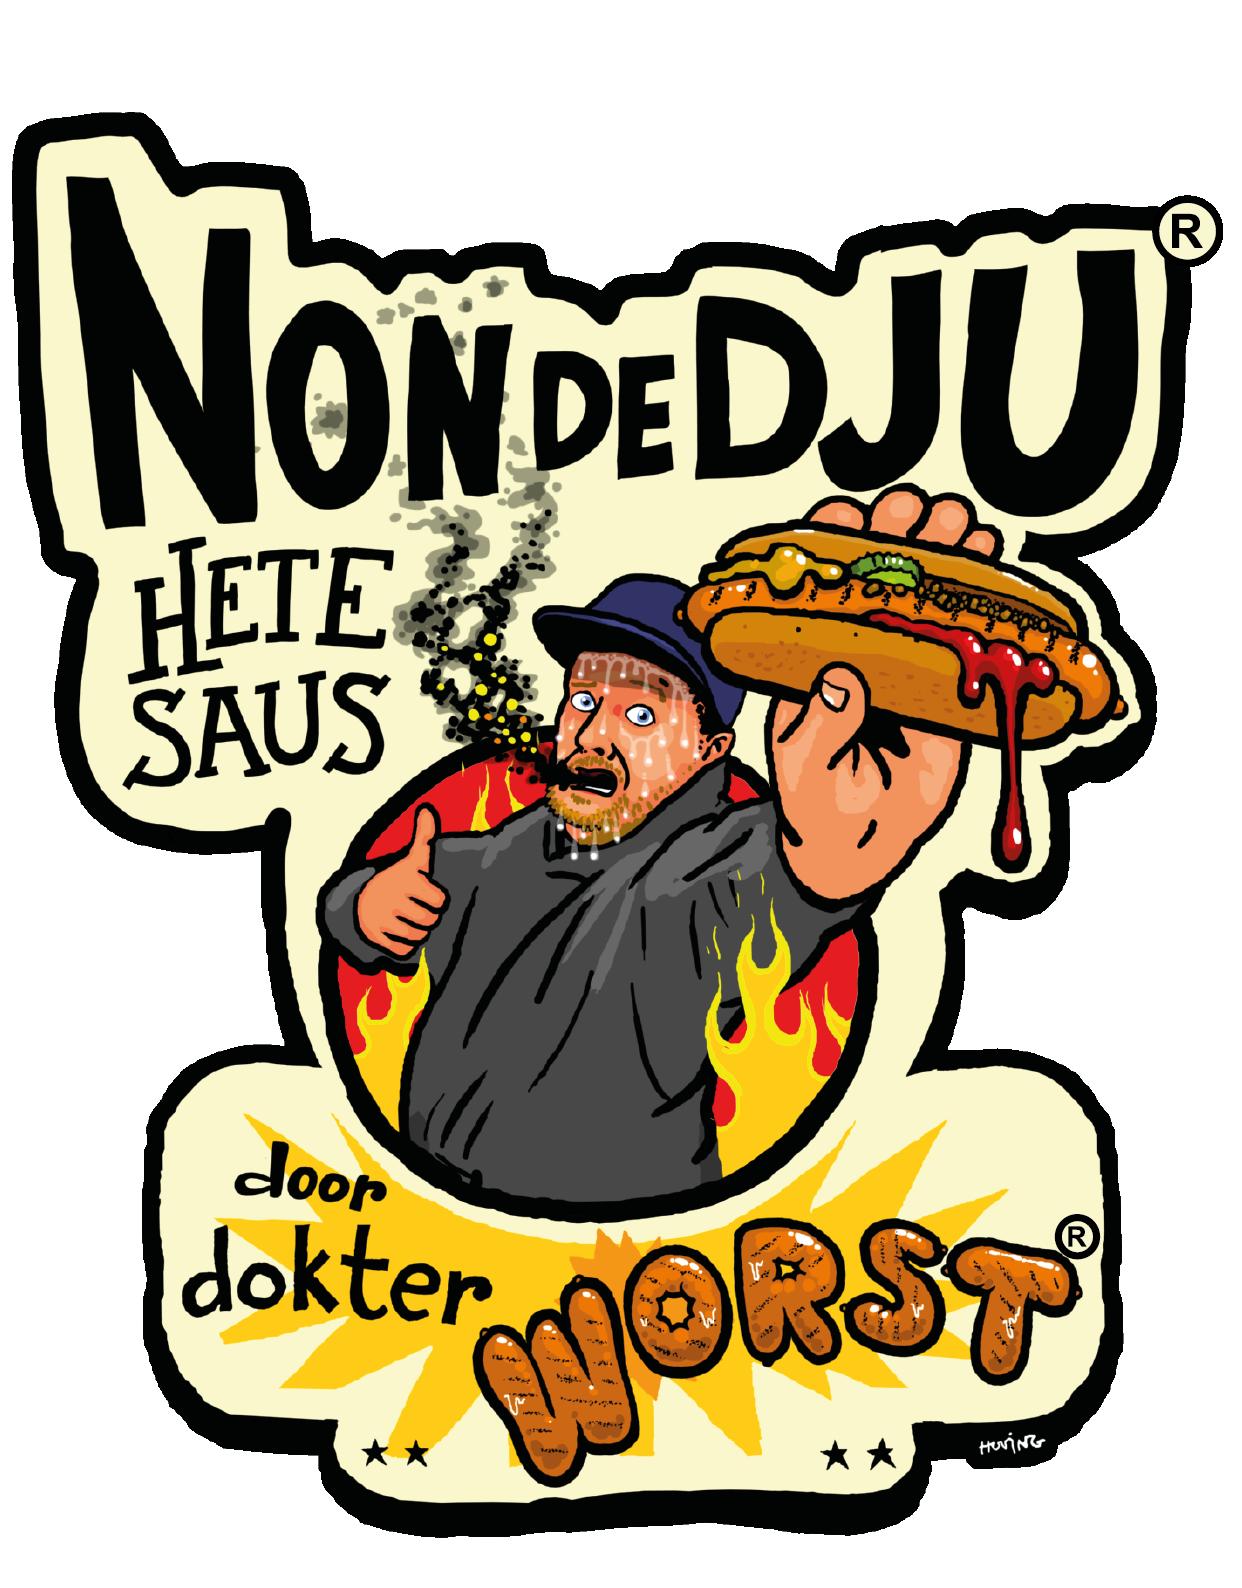 Logo Dokter Worst Nondedju Hete Saus